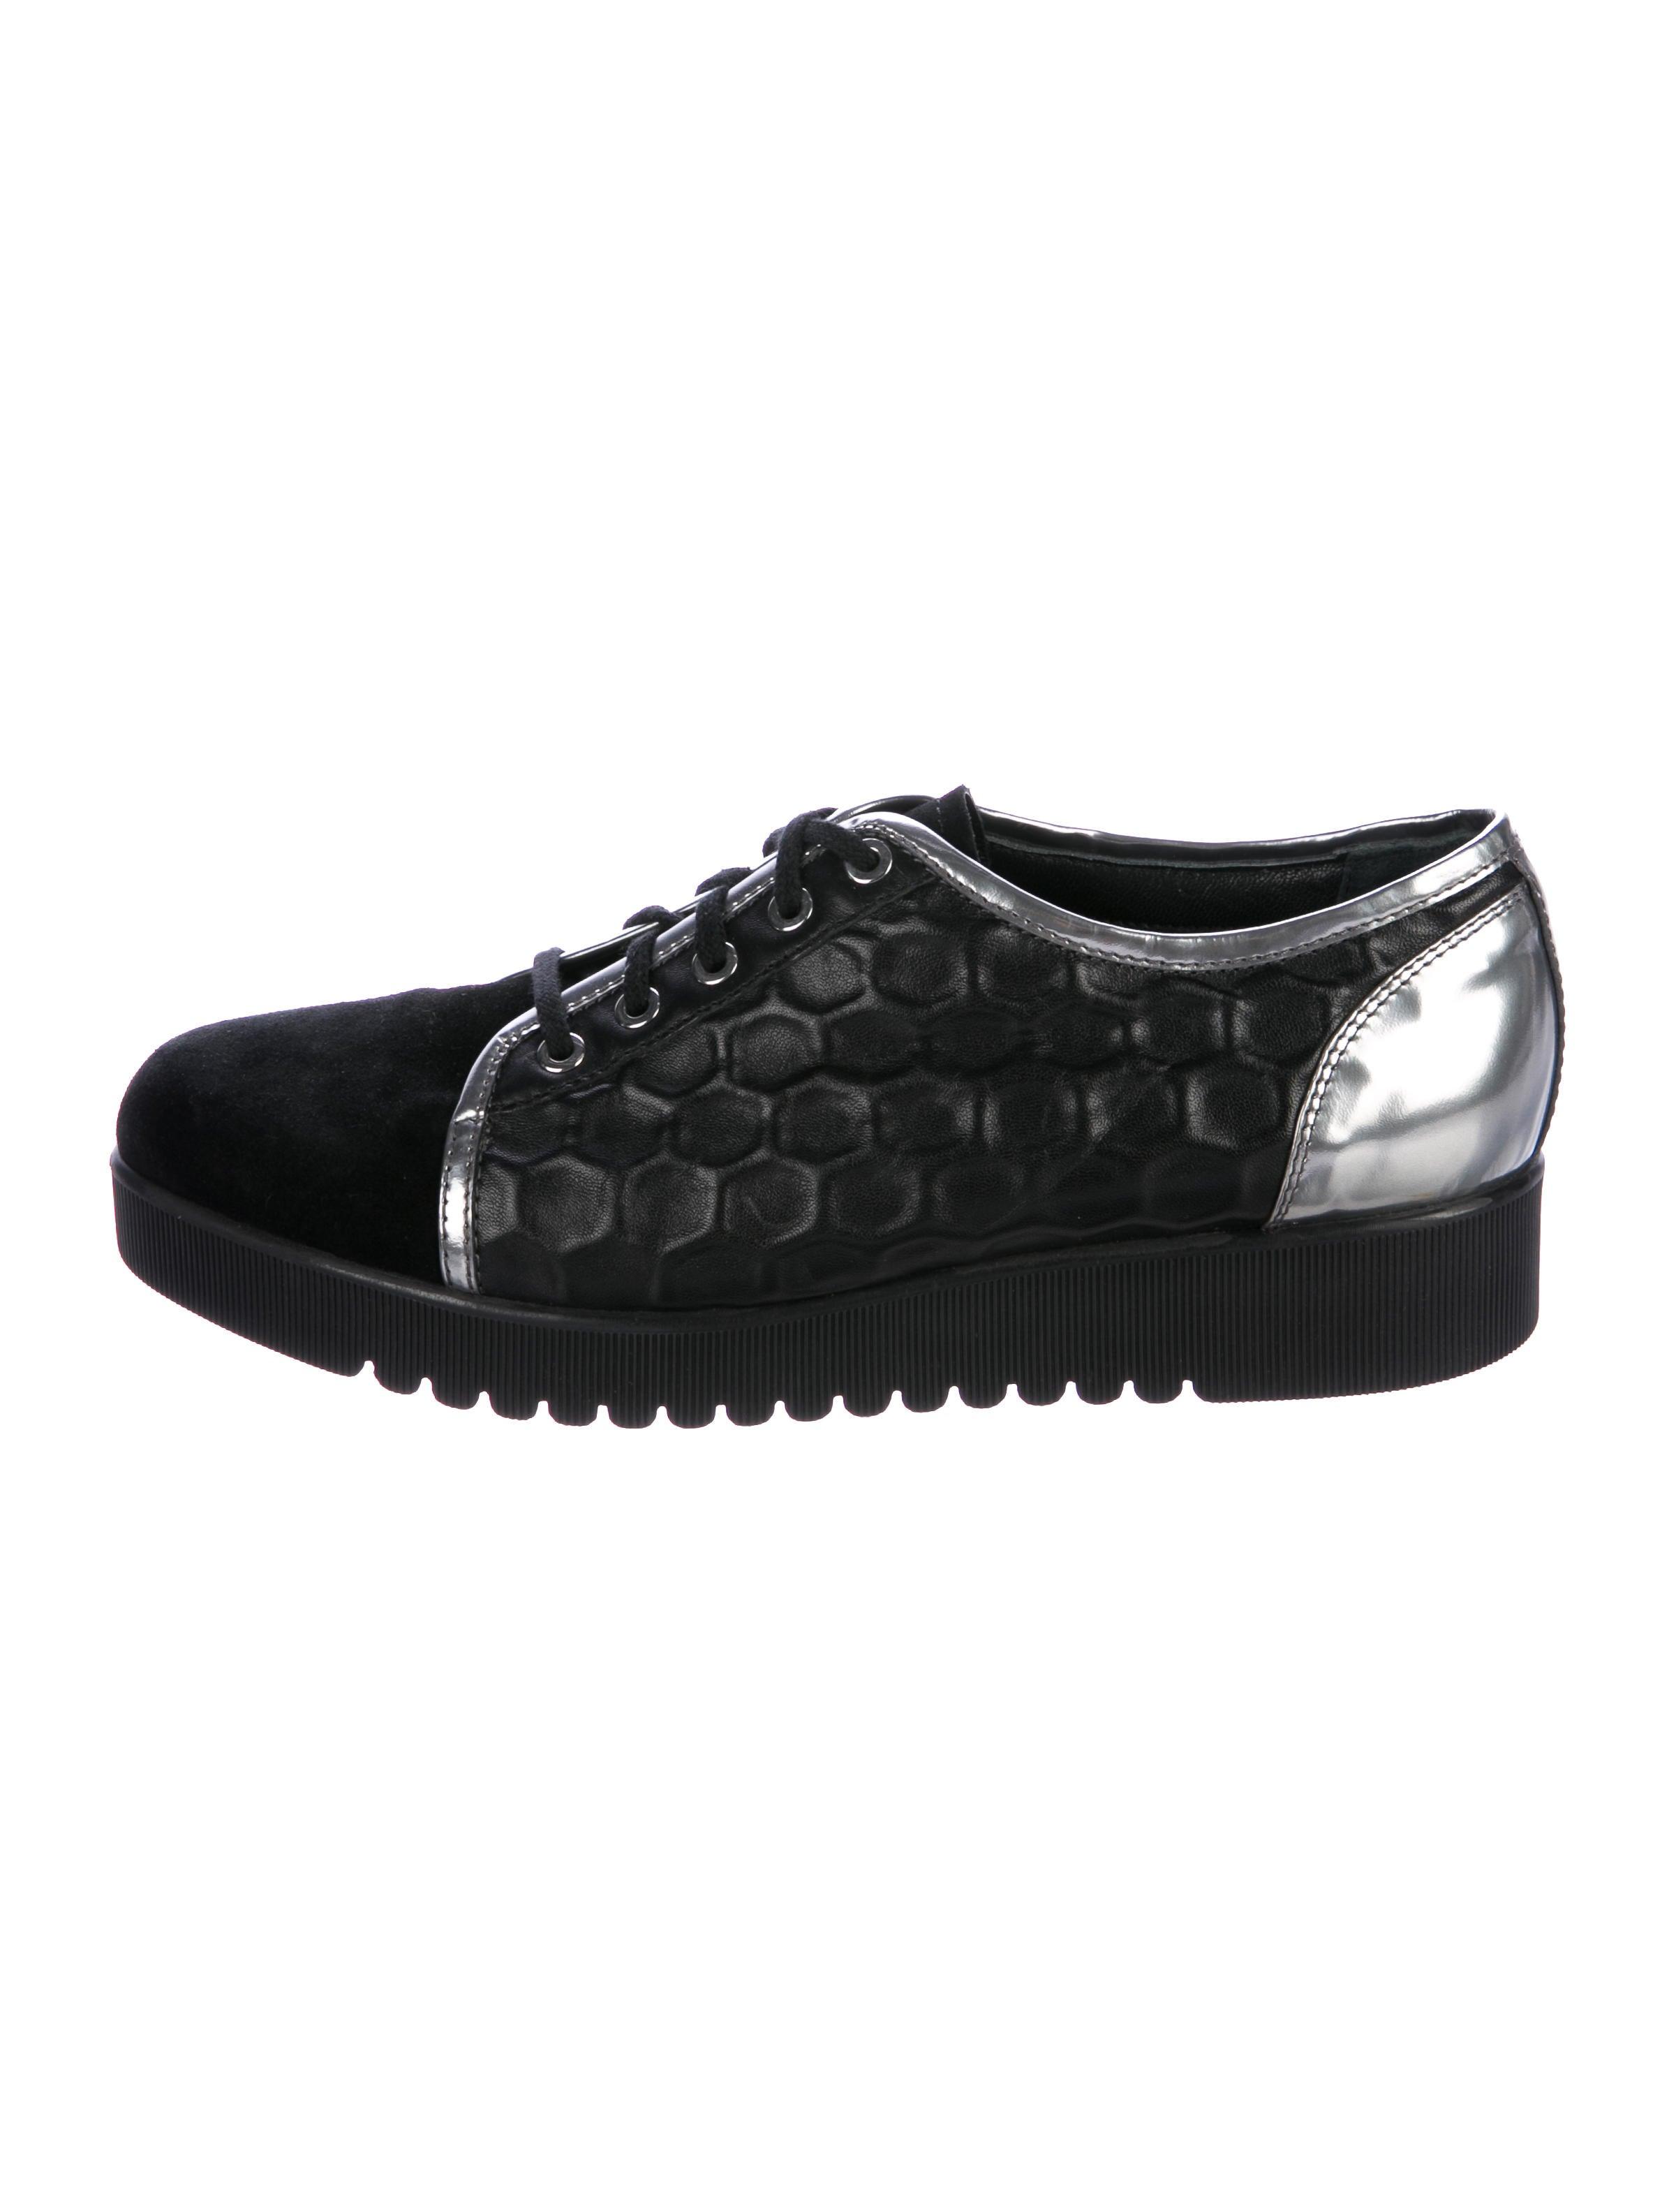 Aquatalia Aida Platform Sneakers sale brand new unisex zSCxi